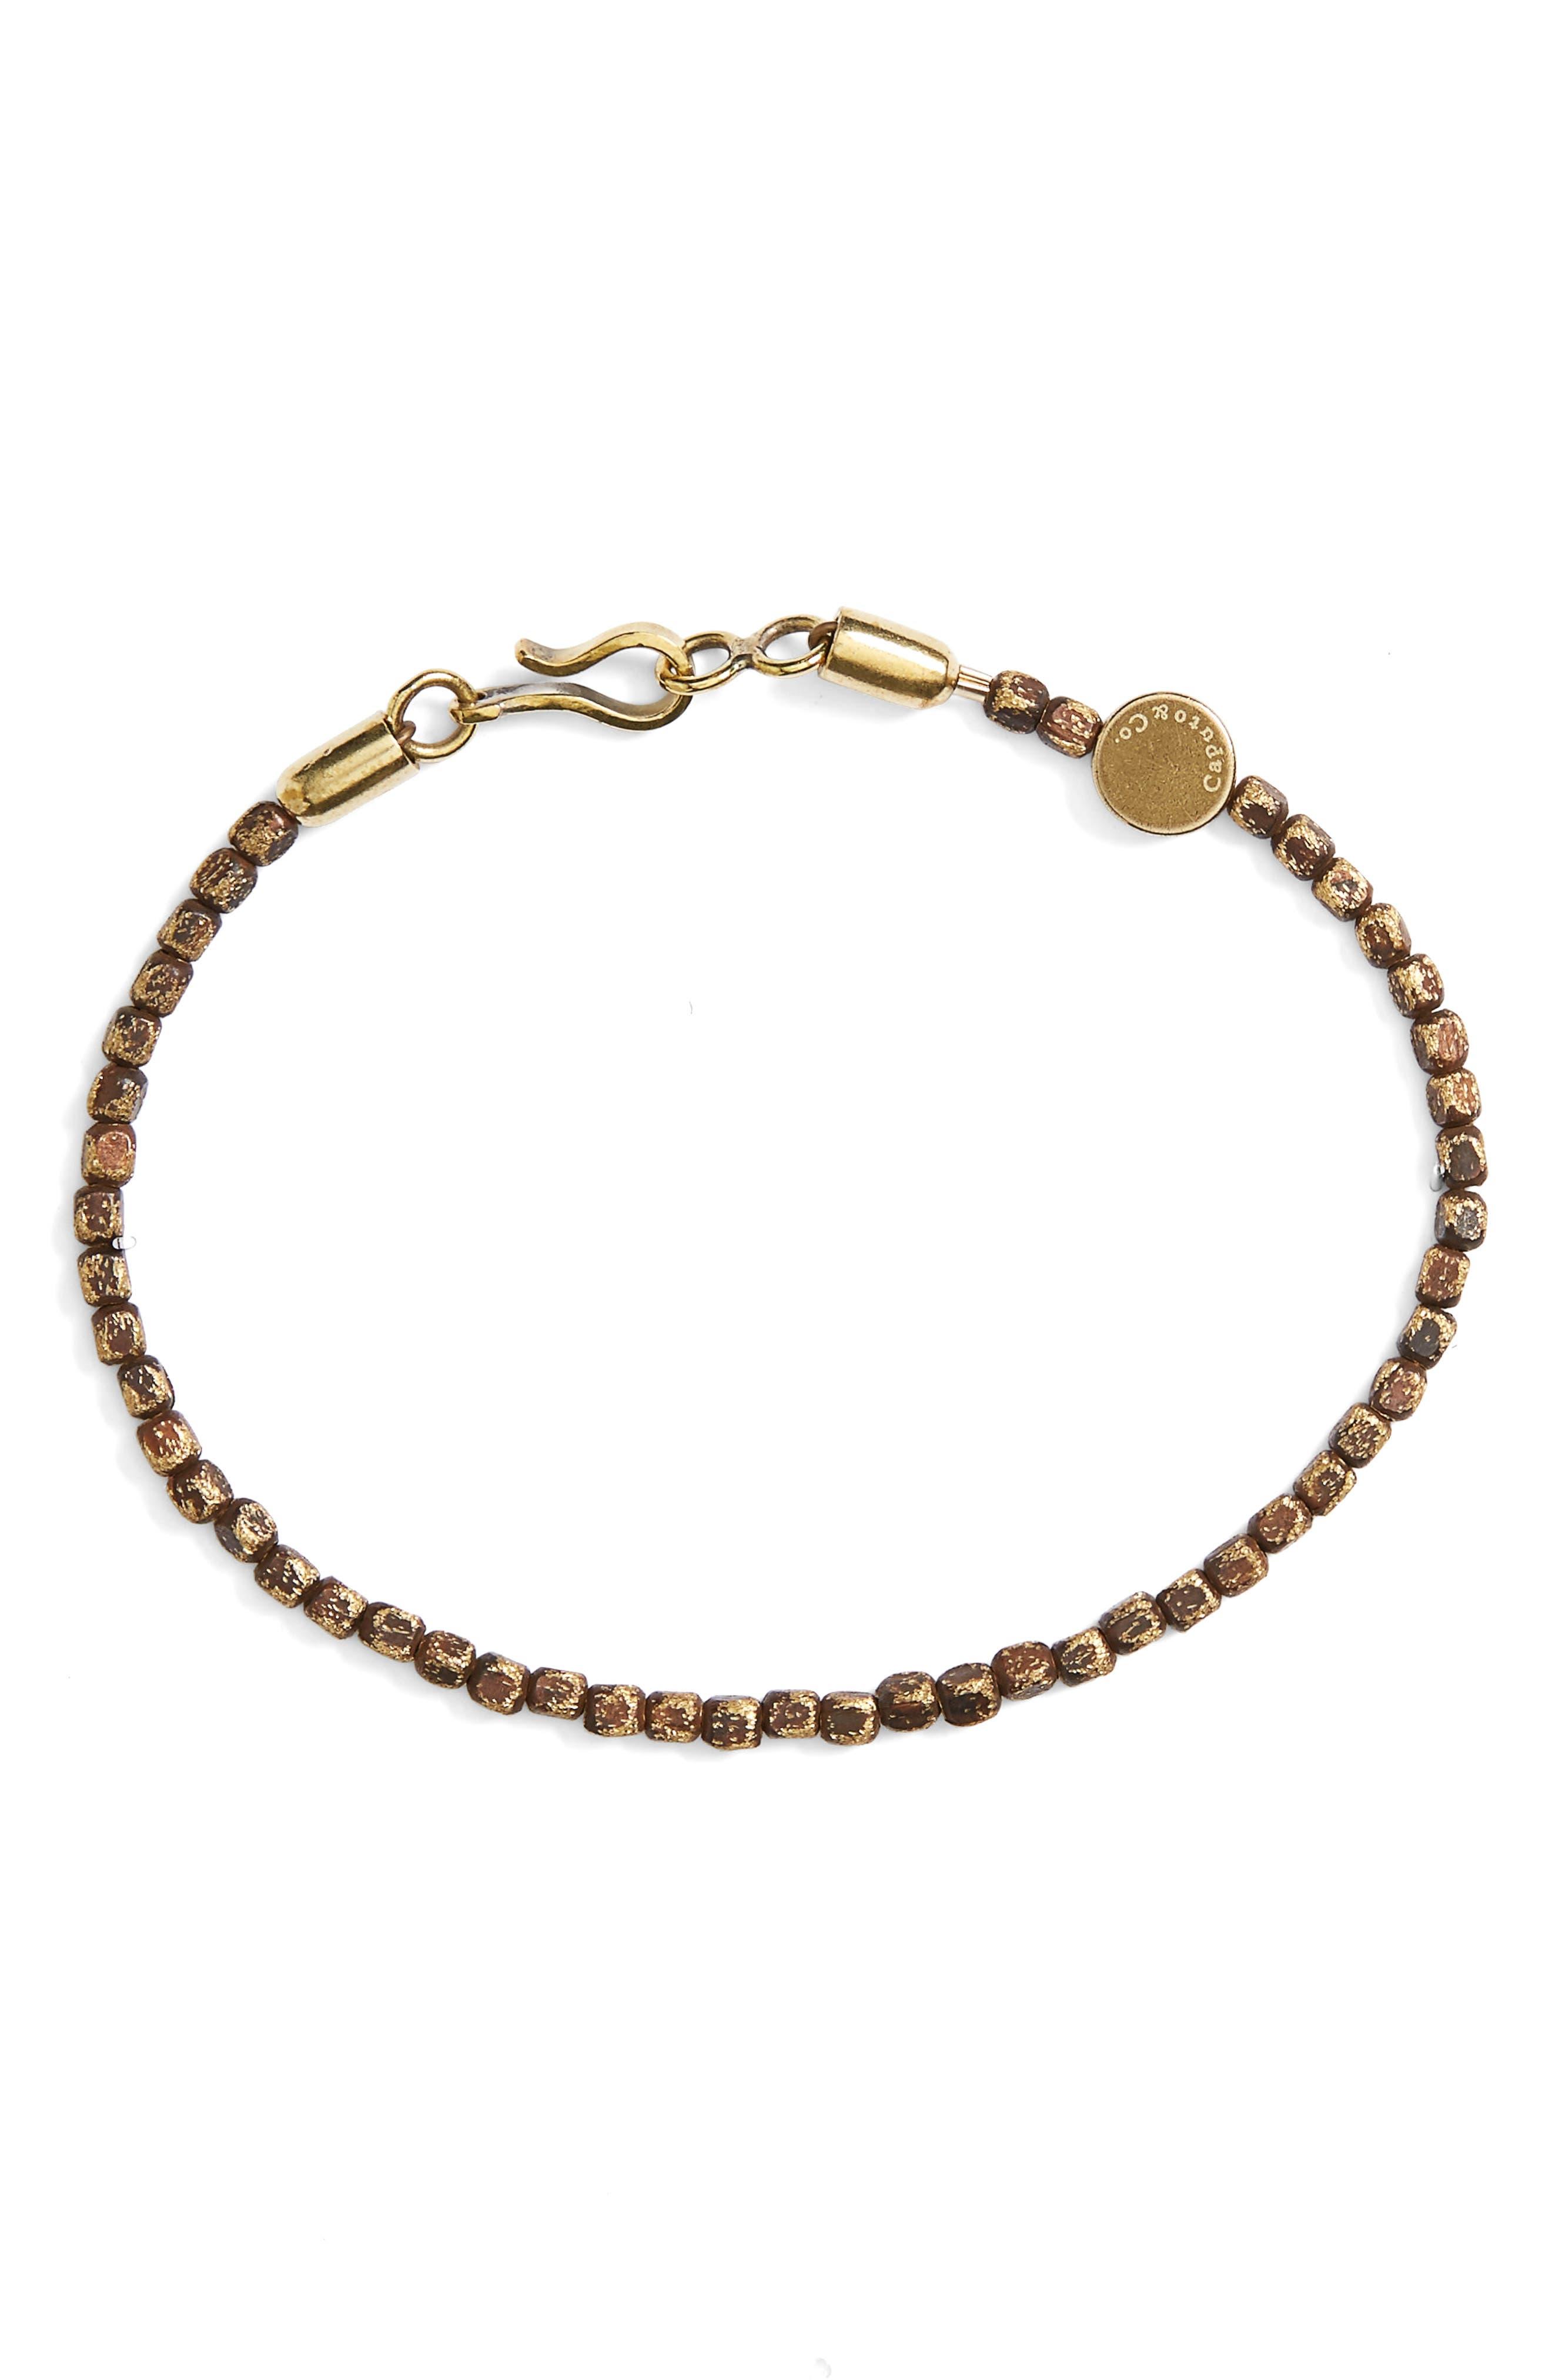 Main Image - Caputo & Co. Brass Bead Bracelet